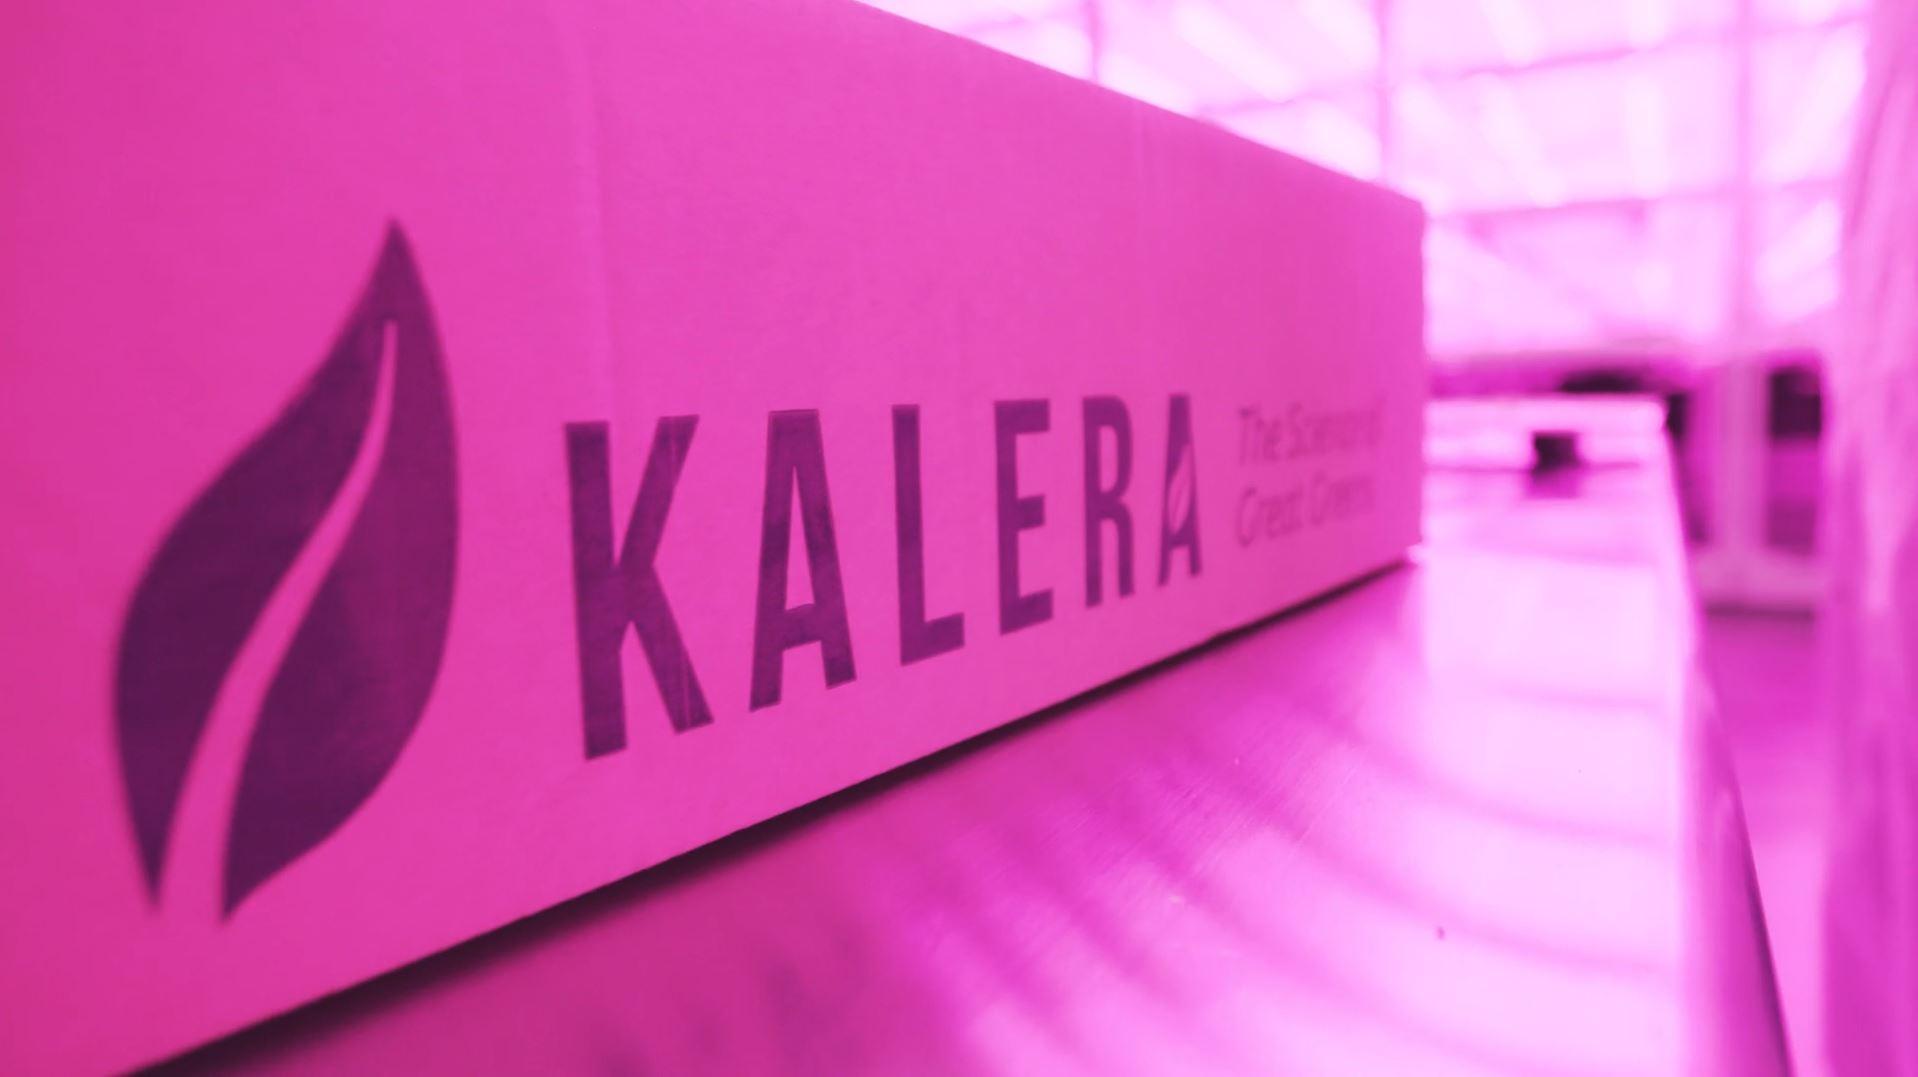 Kalera produce box